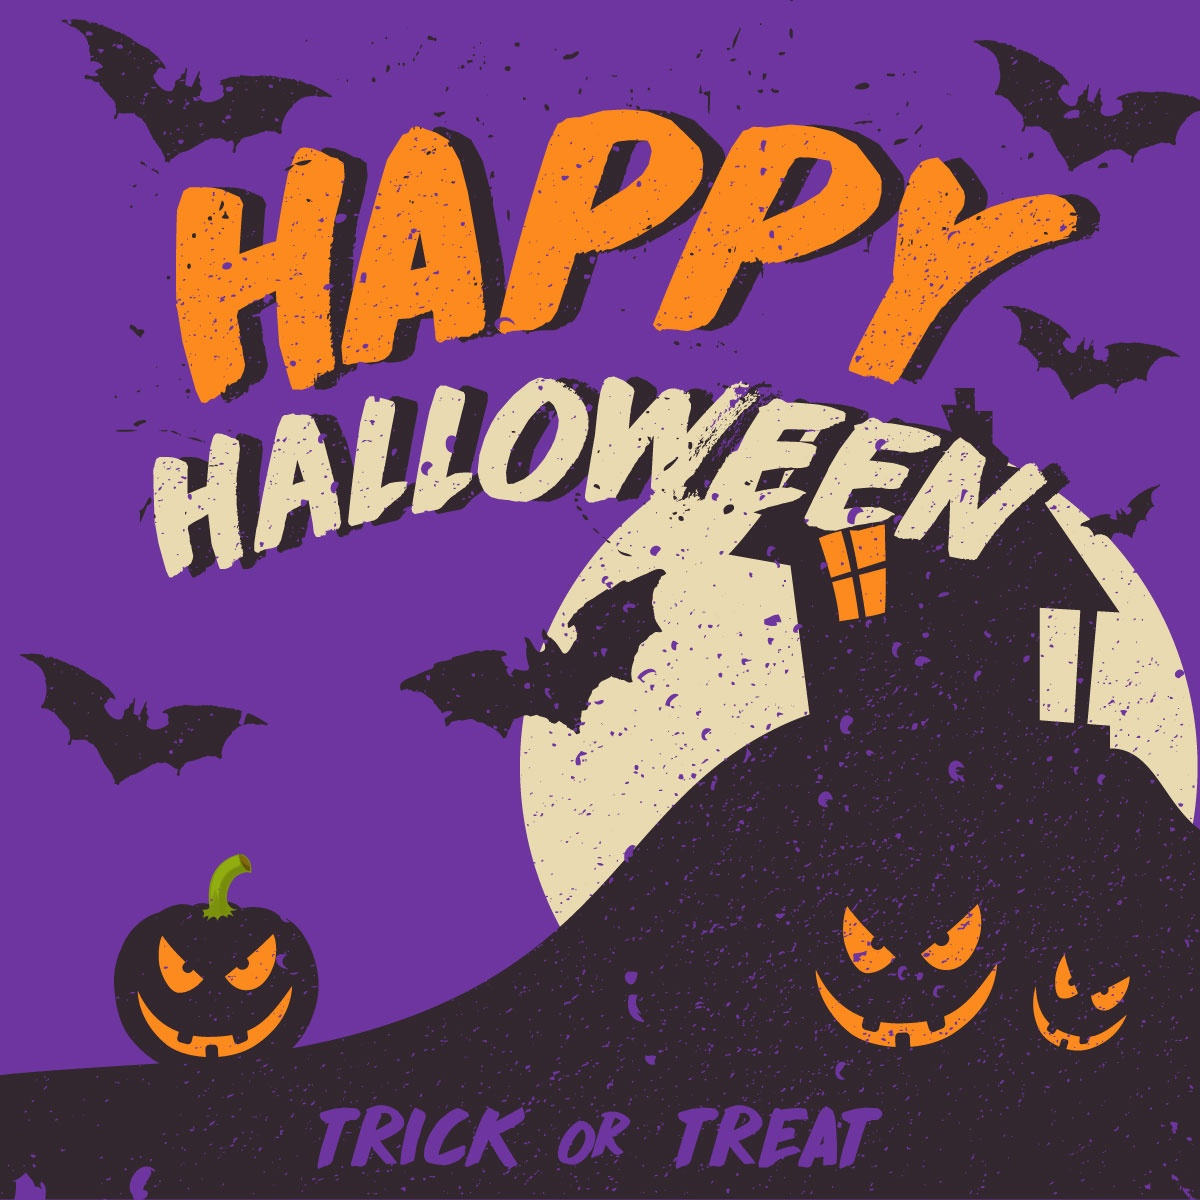 Creepy Halloween Vector Illustration